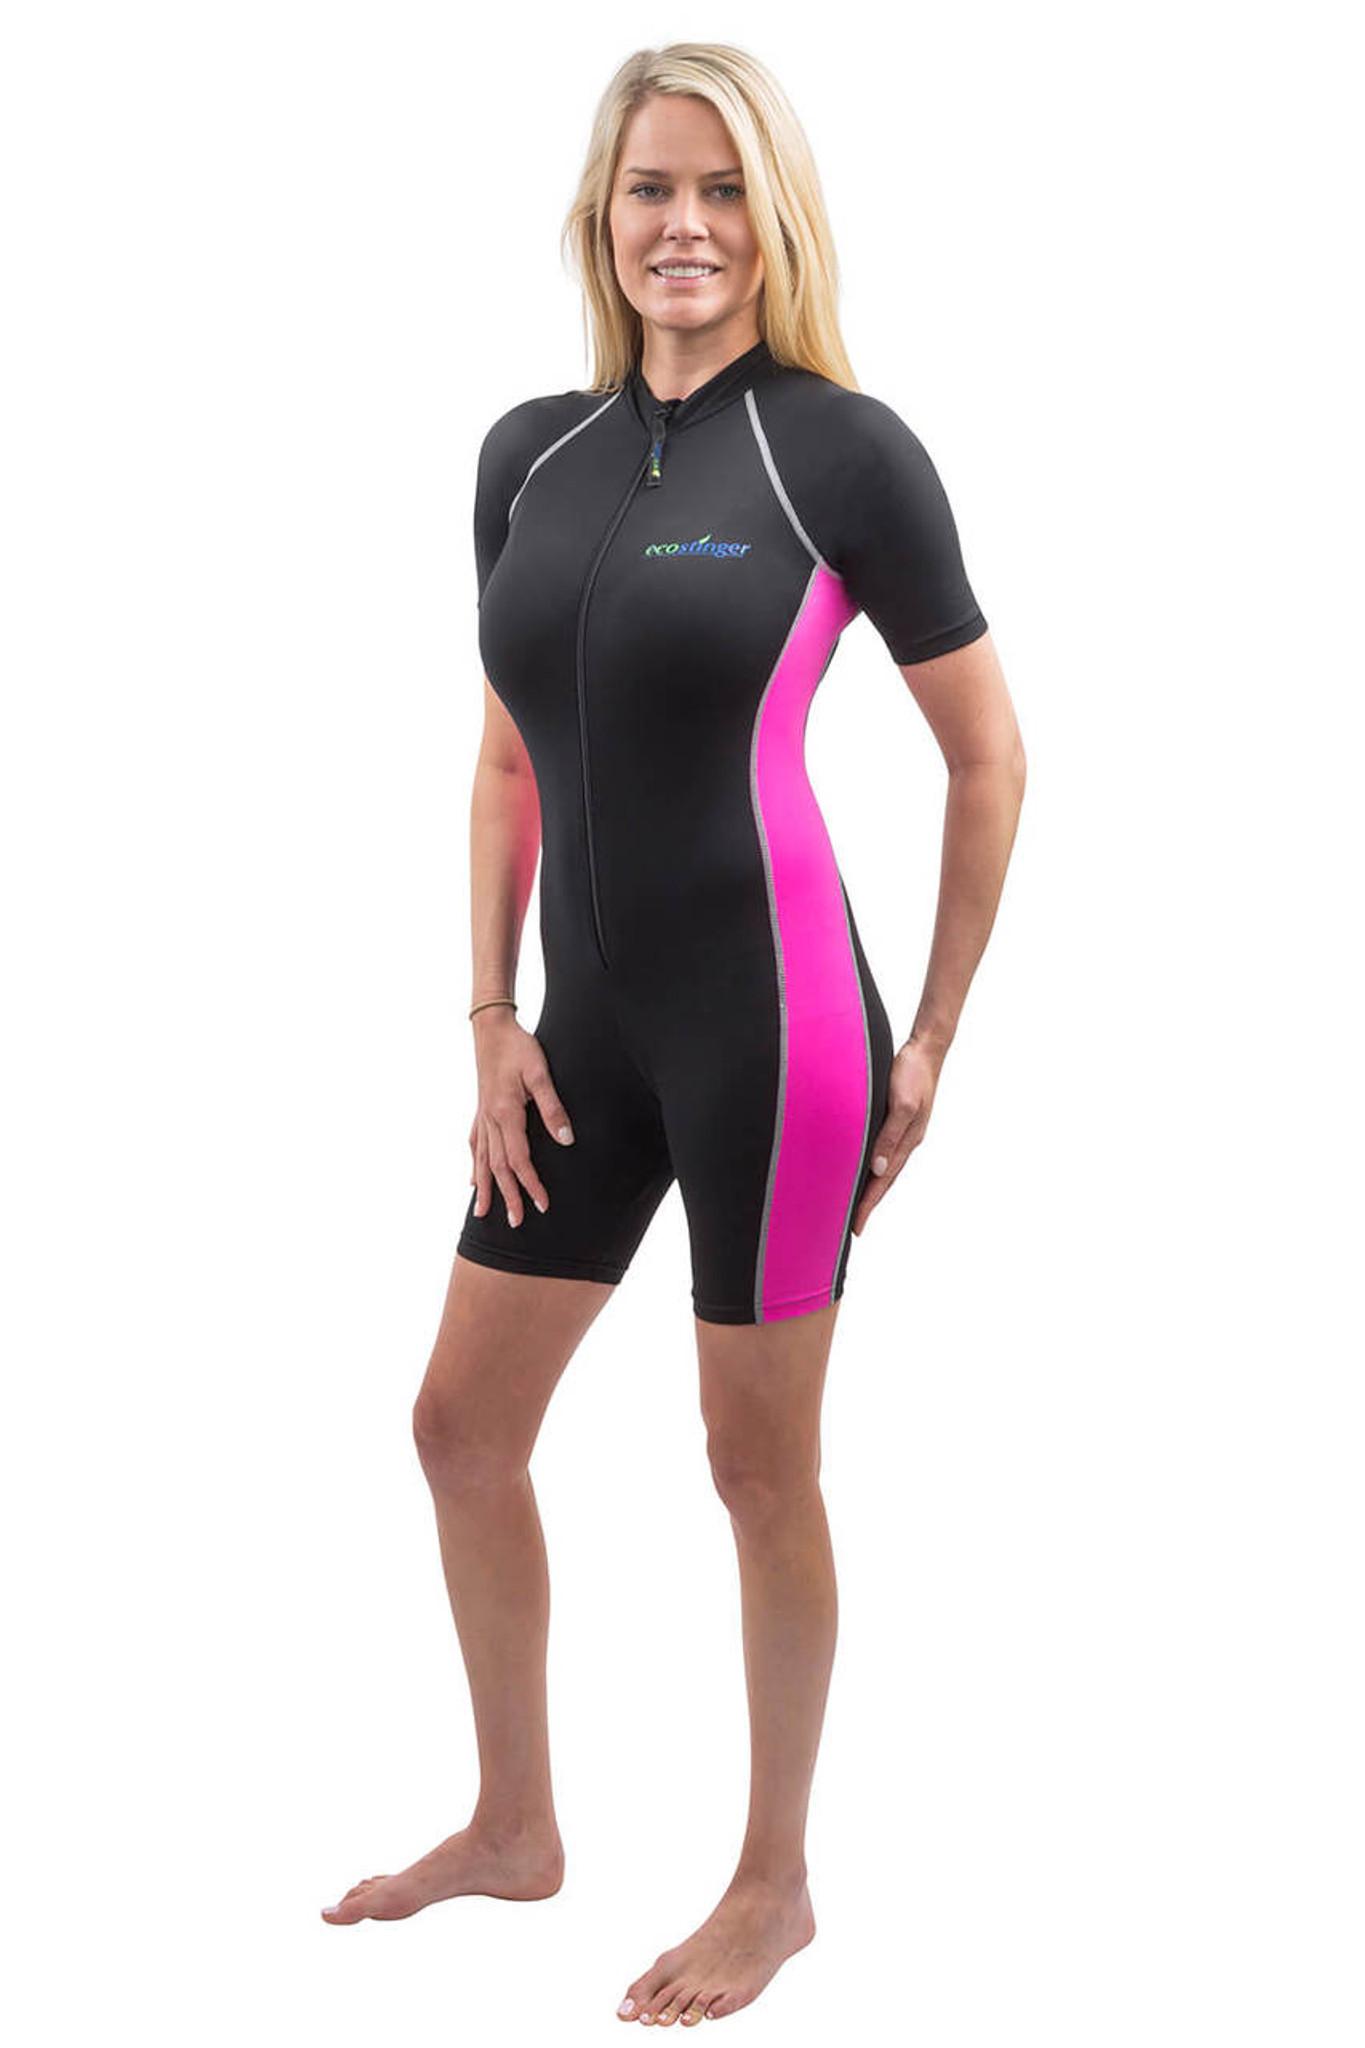 bade2993adf54 Women Sunsuit Bodysuit UV Protection Swimsuit UPF50+ Black Rose (Chlorine  Resistant)